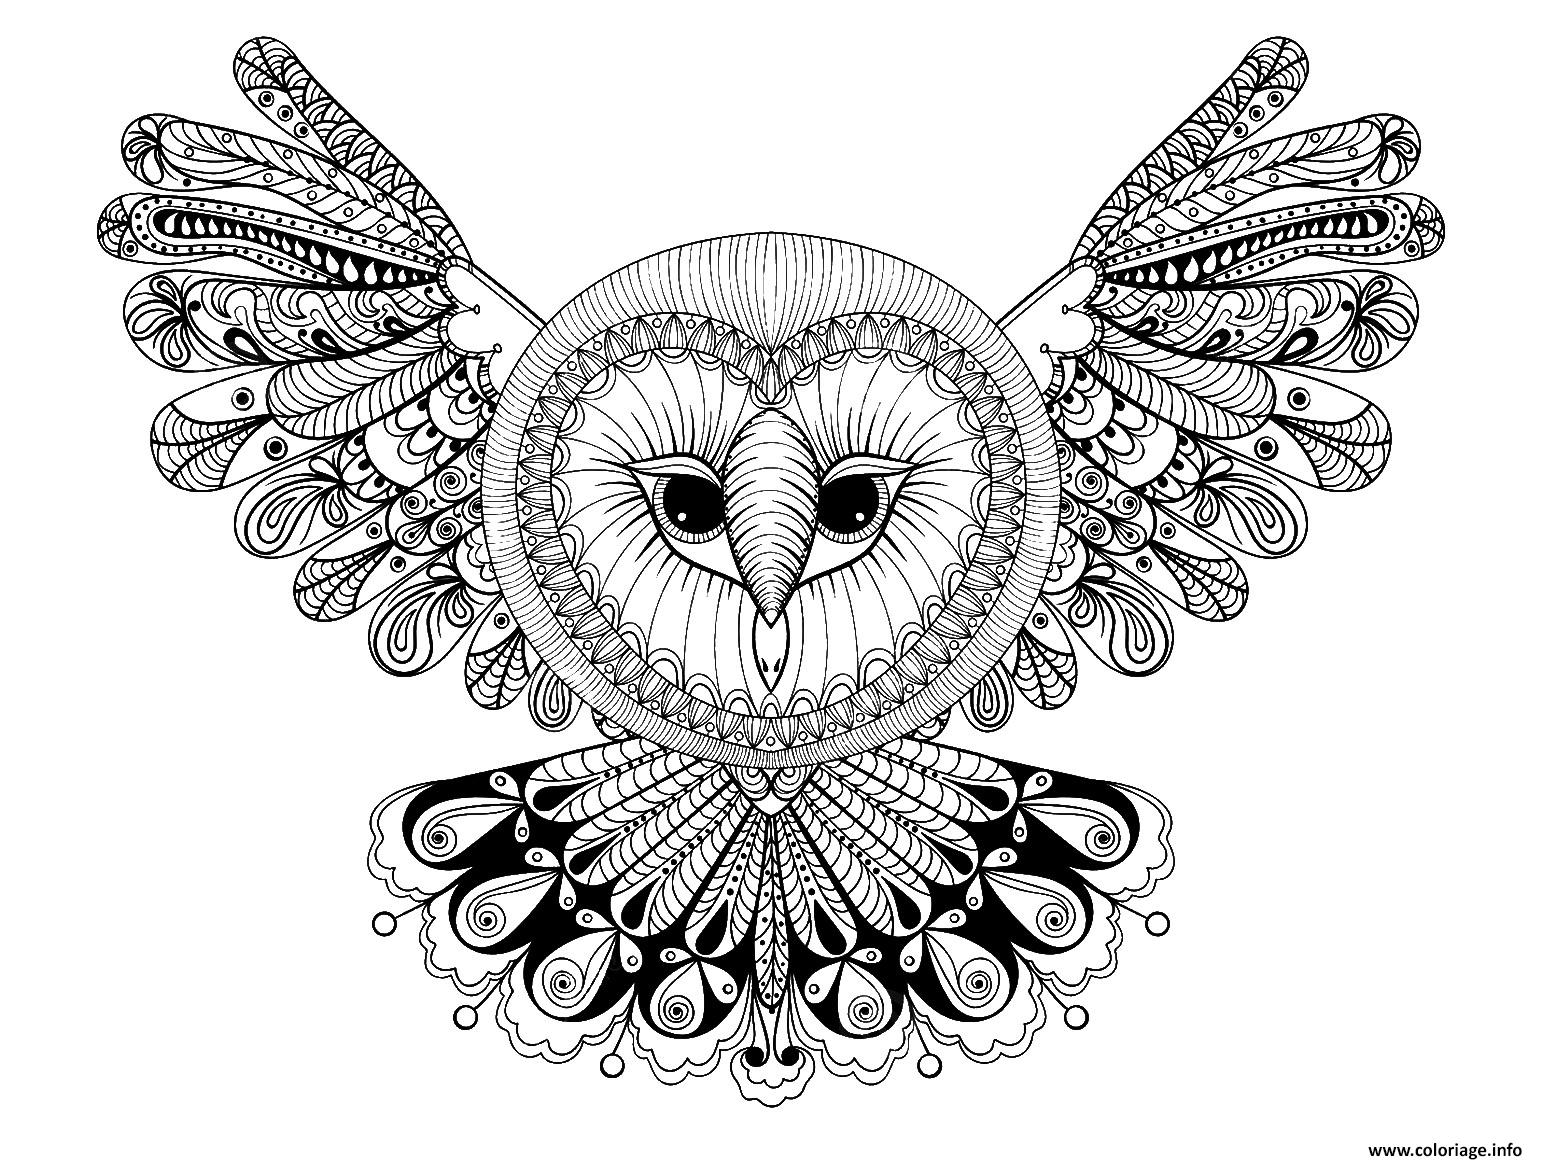 Coloriage hibou avec grande tete forme mandala adulte animaux dessin - Grand mandala ...